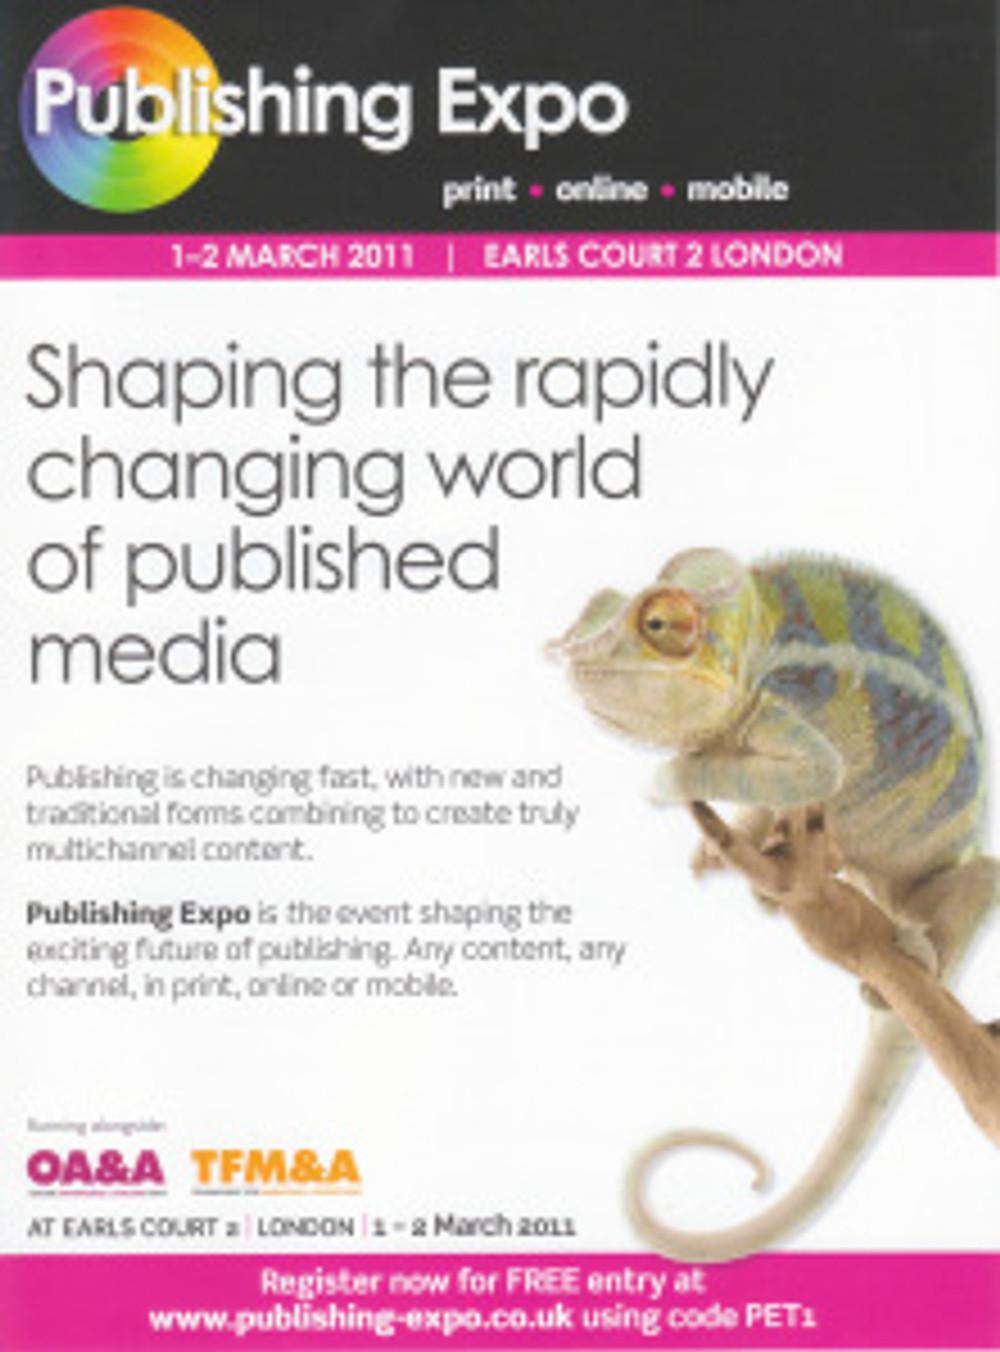 Publishing Expo poster